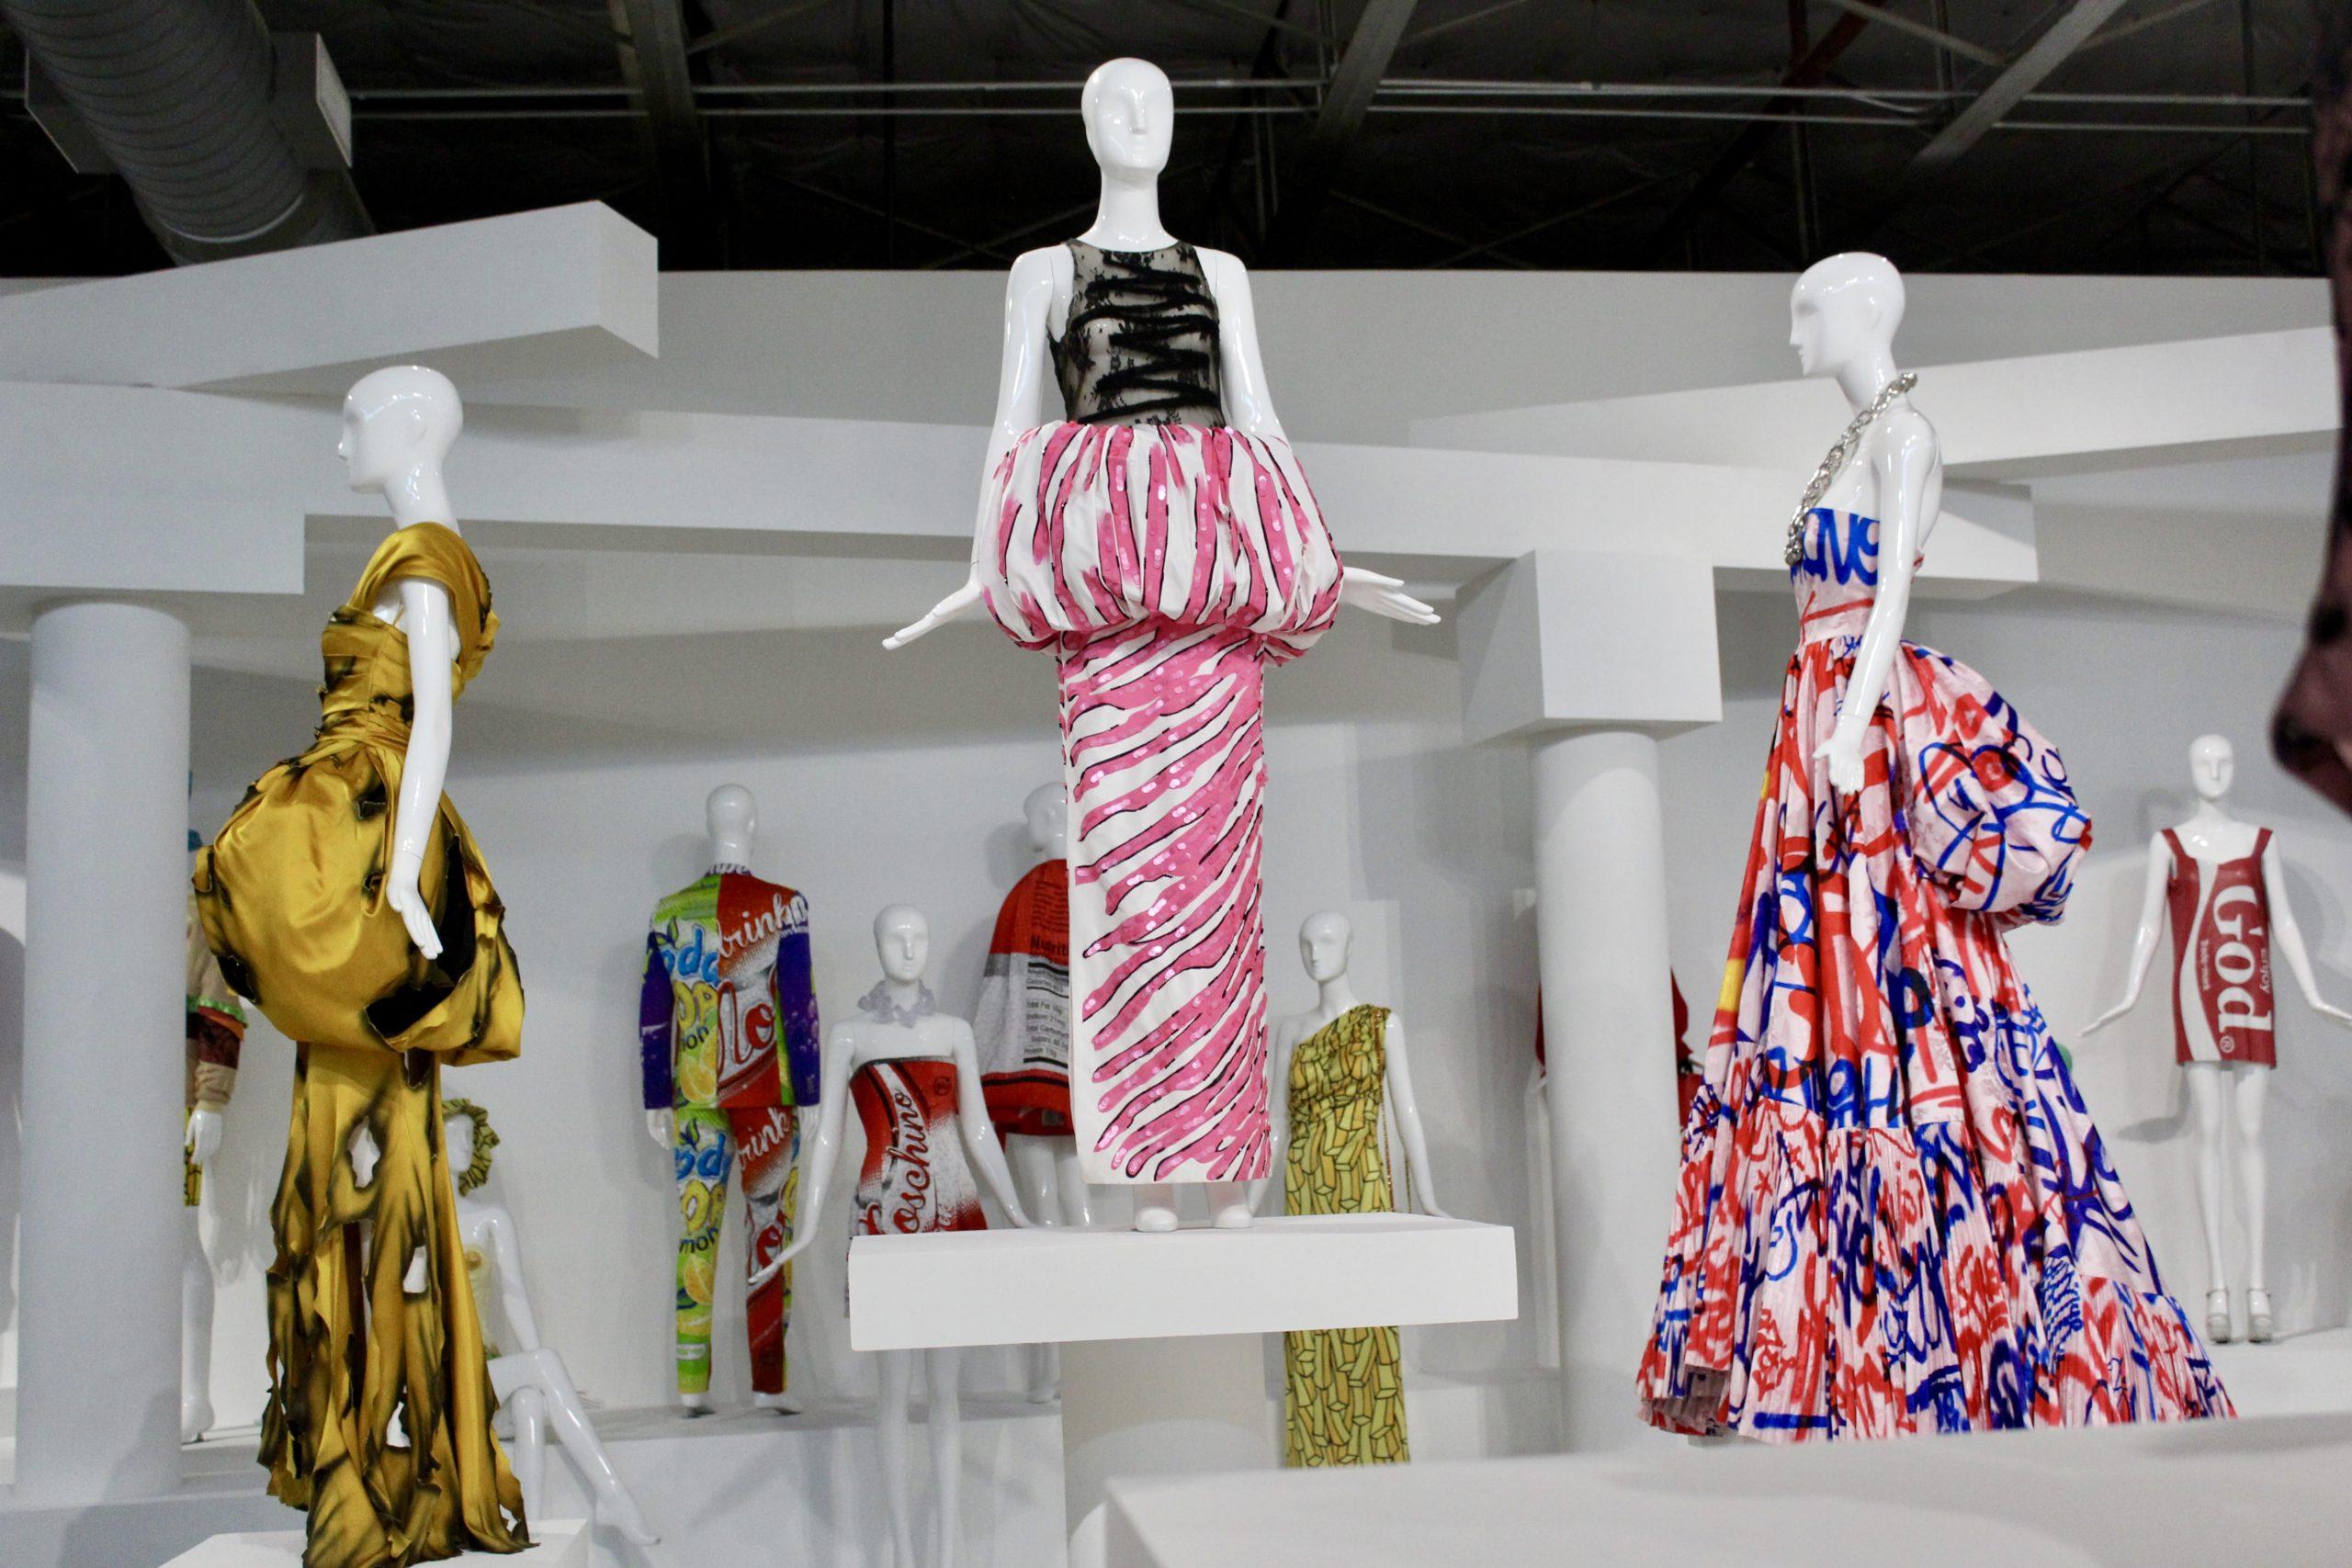 fullsizeoutput 8212 scaled - Jeremy Scott Makes Fashion Fun